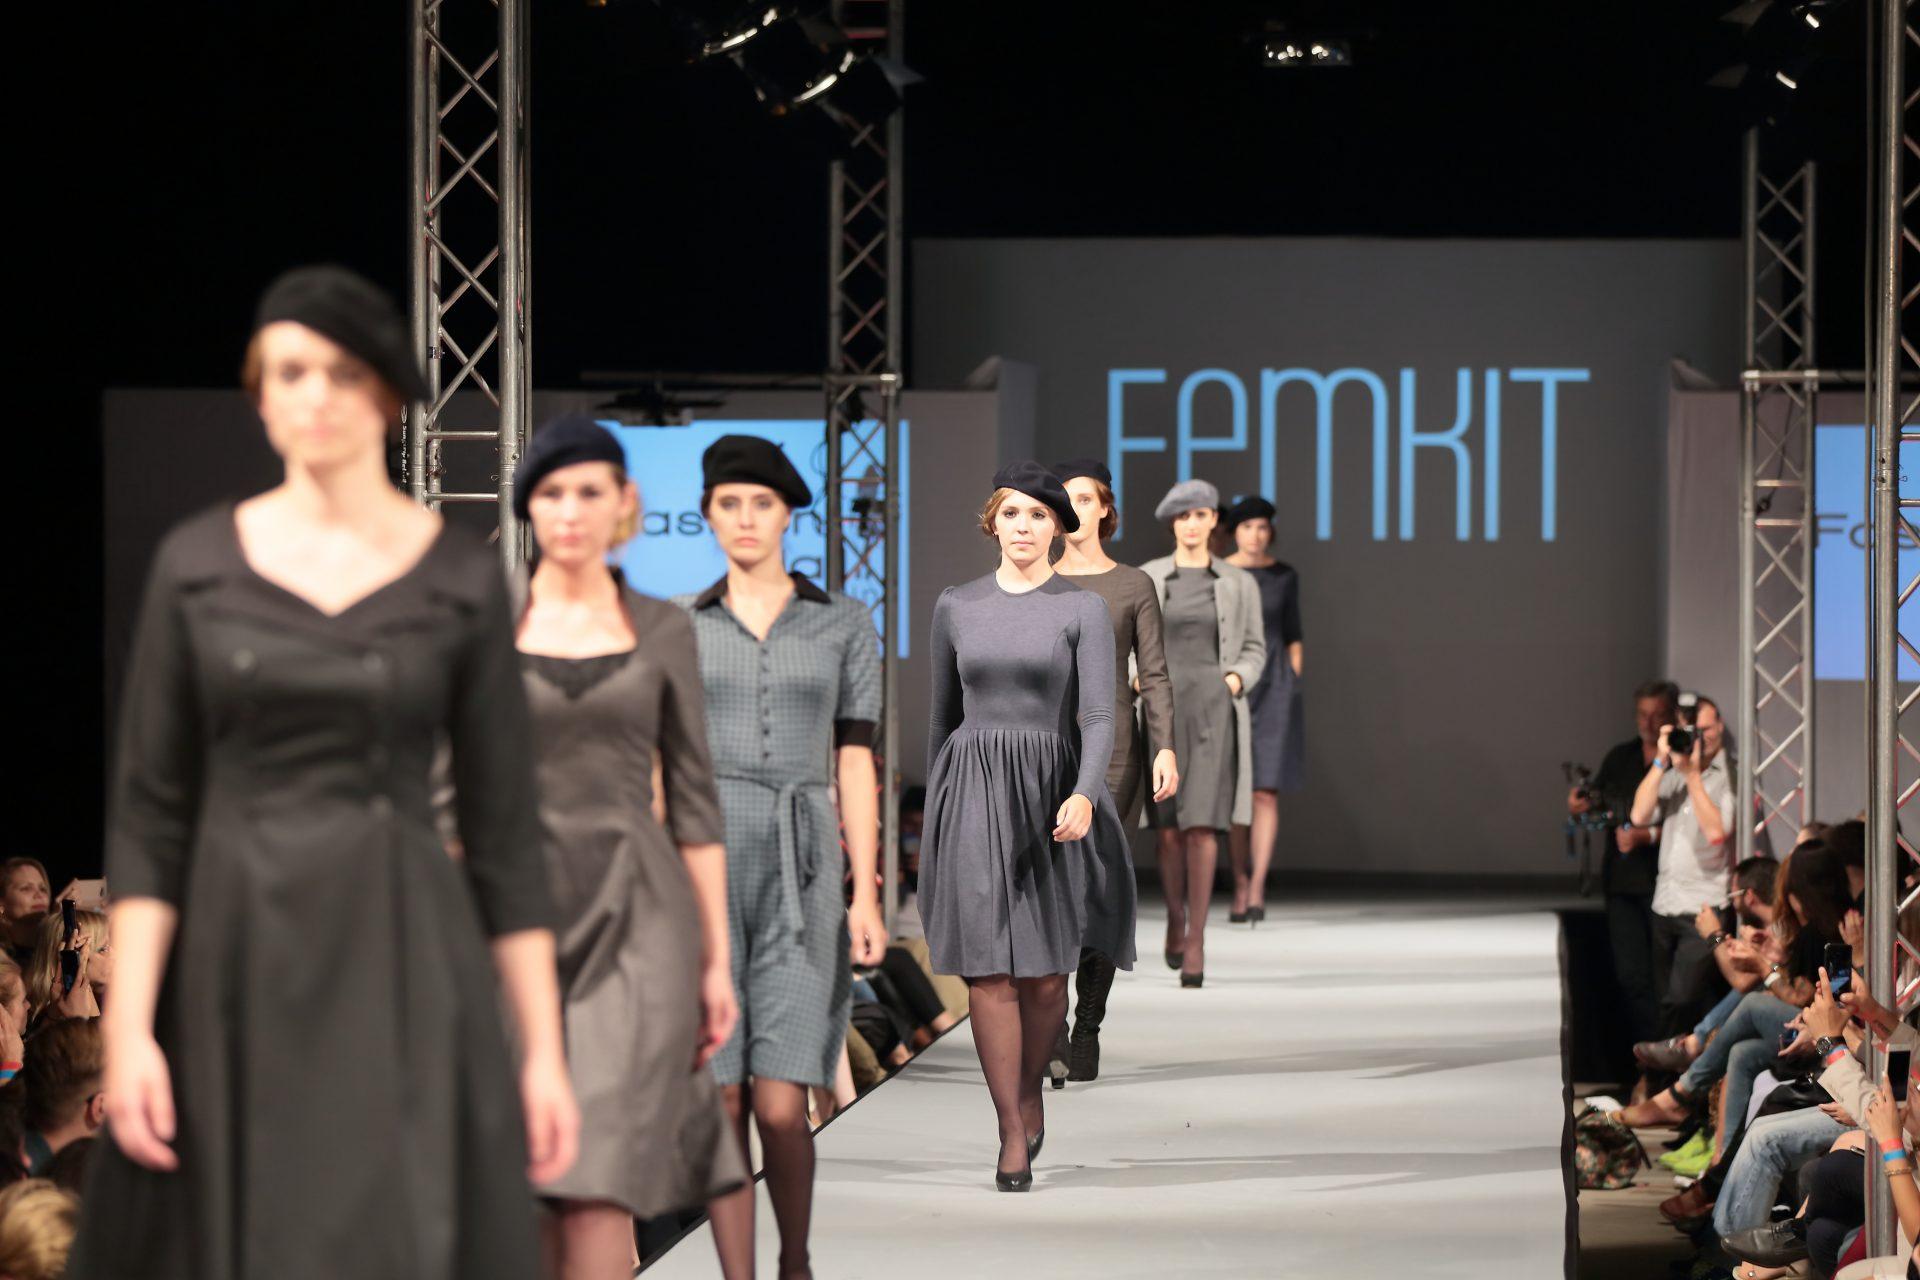 2017-07-03_Fashion Hall_FEMKIT (66)